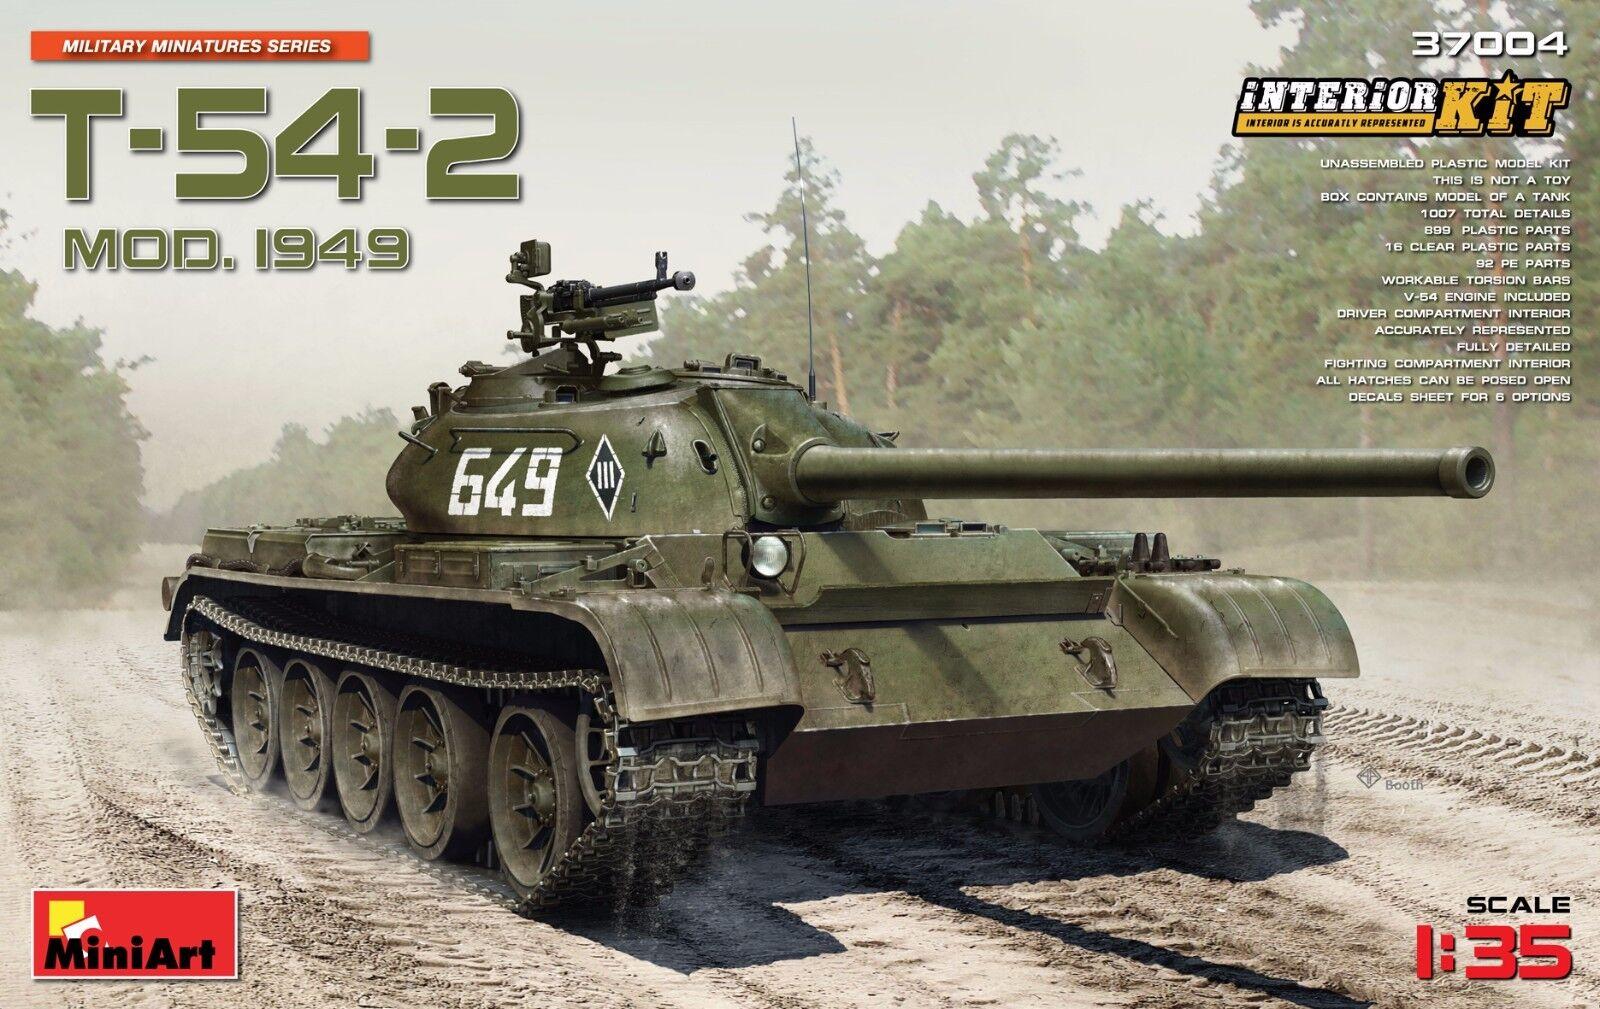 PLASTIC MODEL KIT T-54-2 SOVIET MEDIUM TANK. Mod 1949 1 35 MINIART 37004